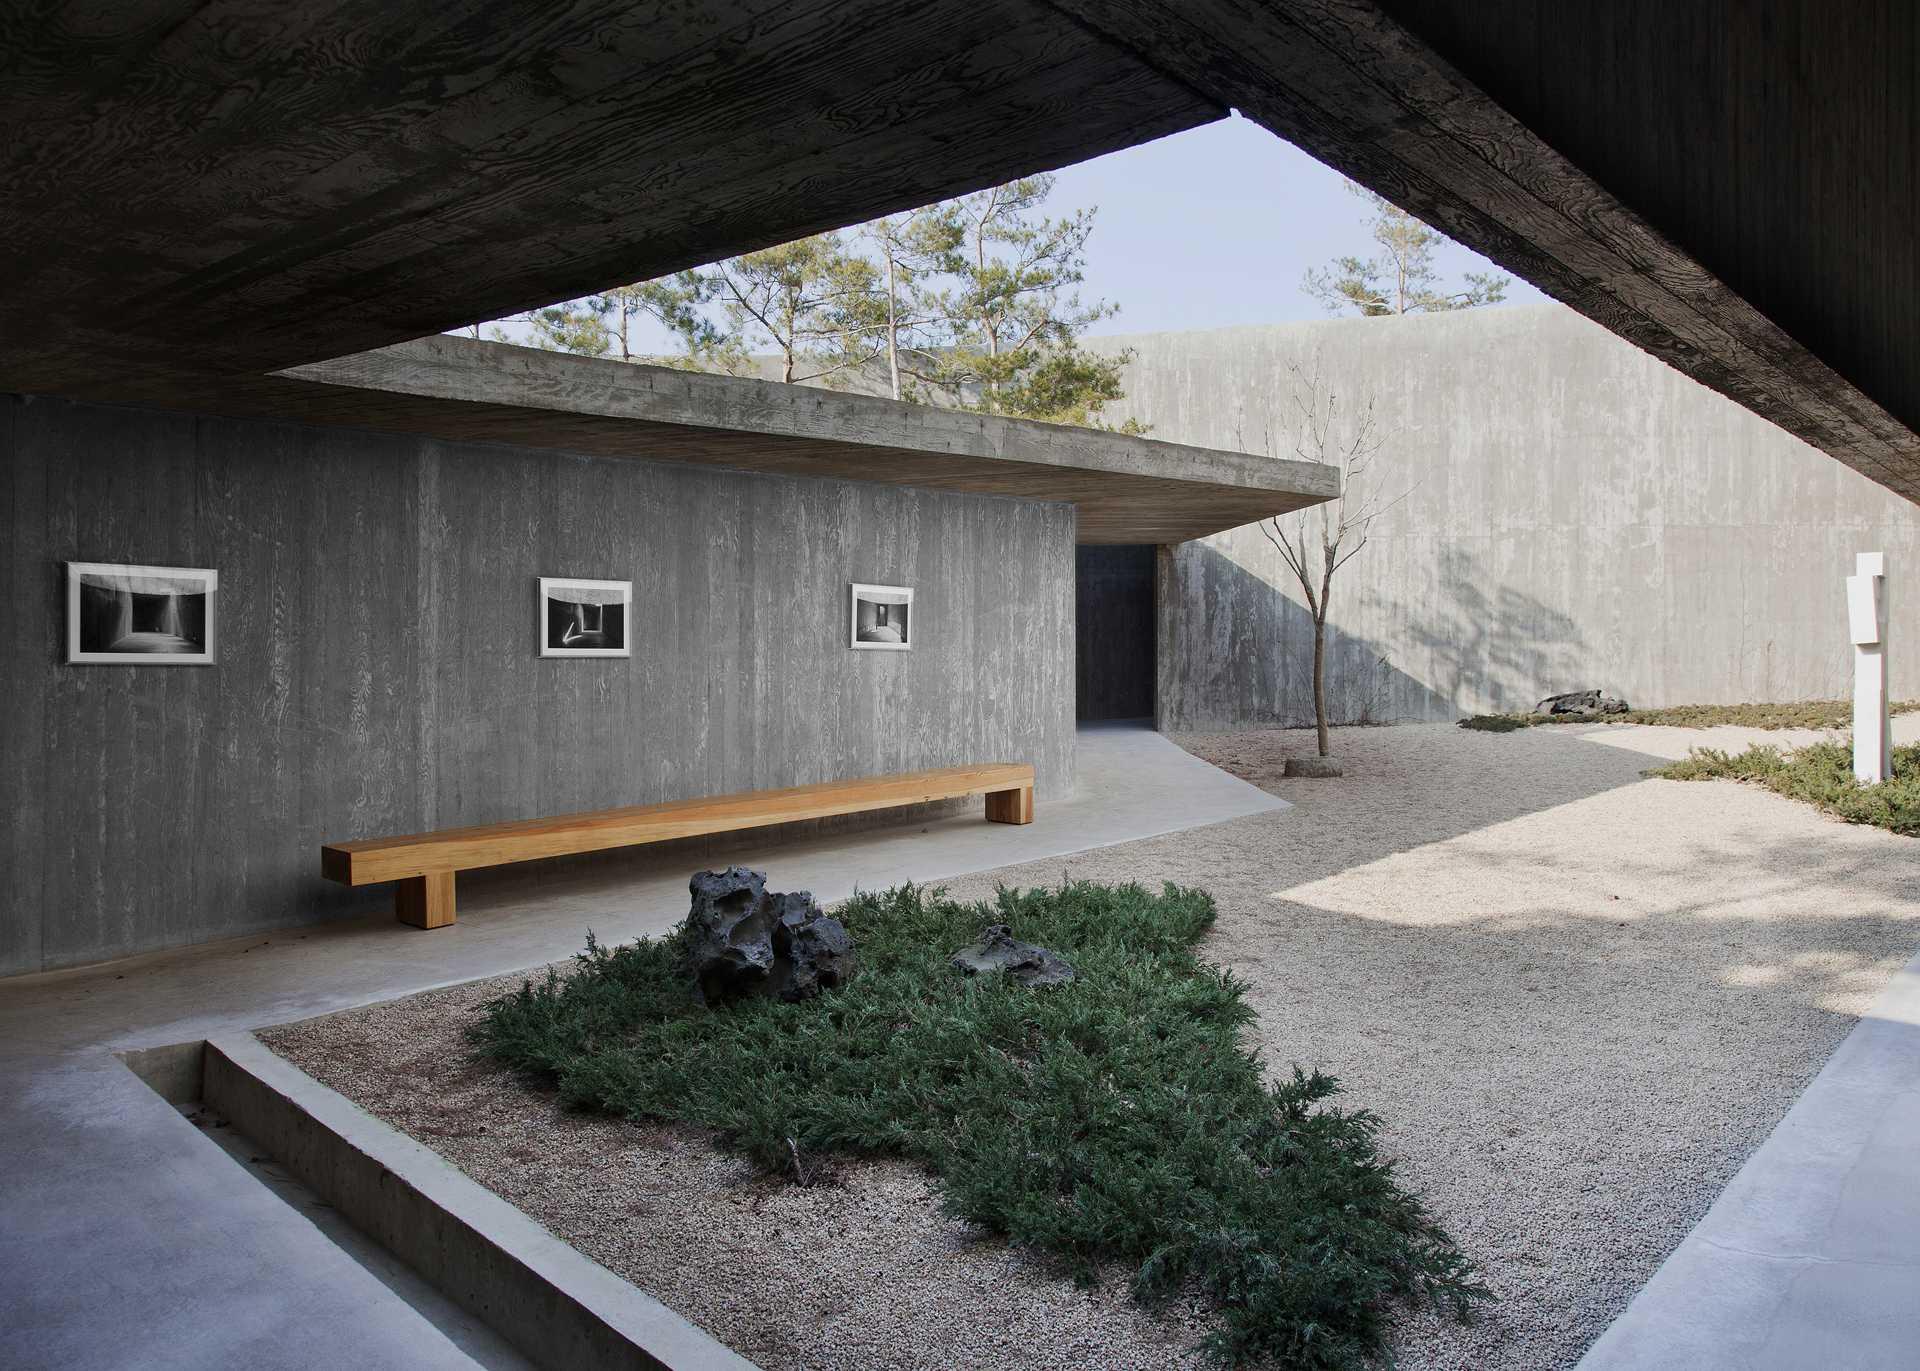 Art Pavilion in Saya Park  - 10 JongOh Kim 50